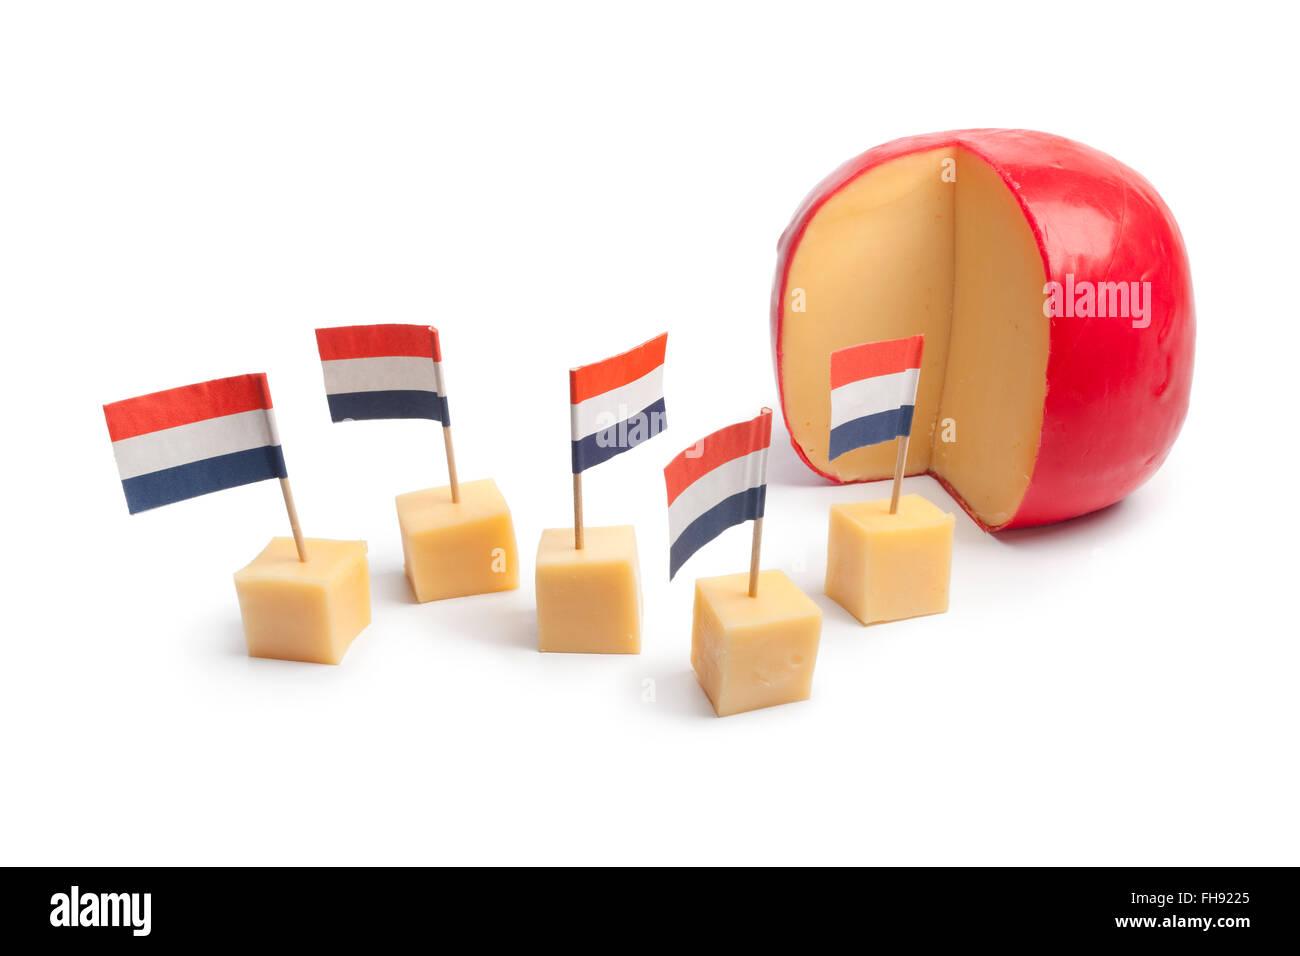 Dutch Edam cheese blocks with the Dutch flag on white background - Stock Image